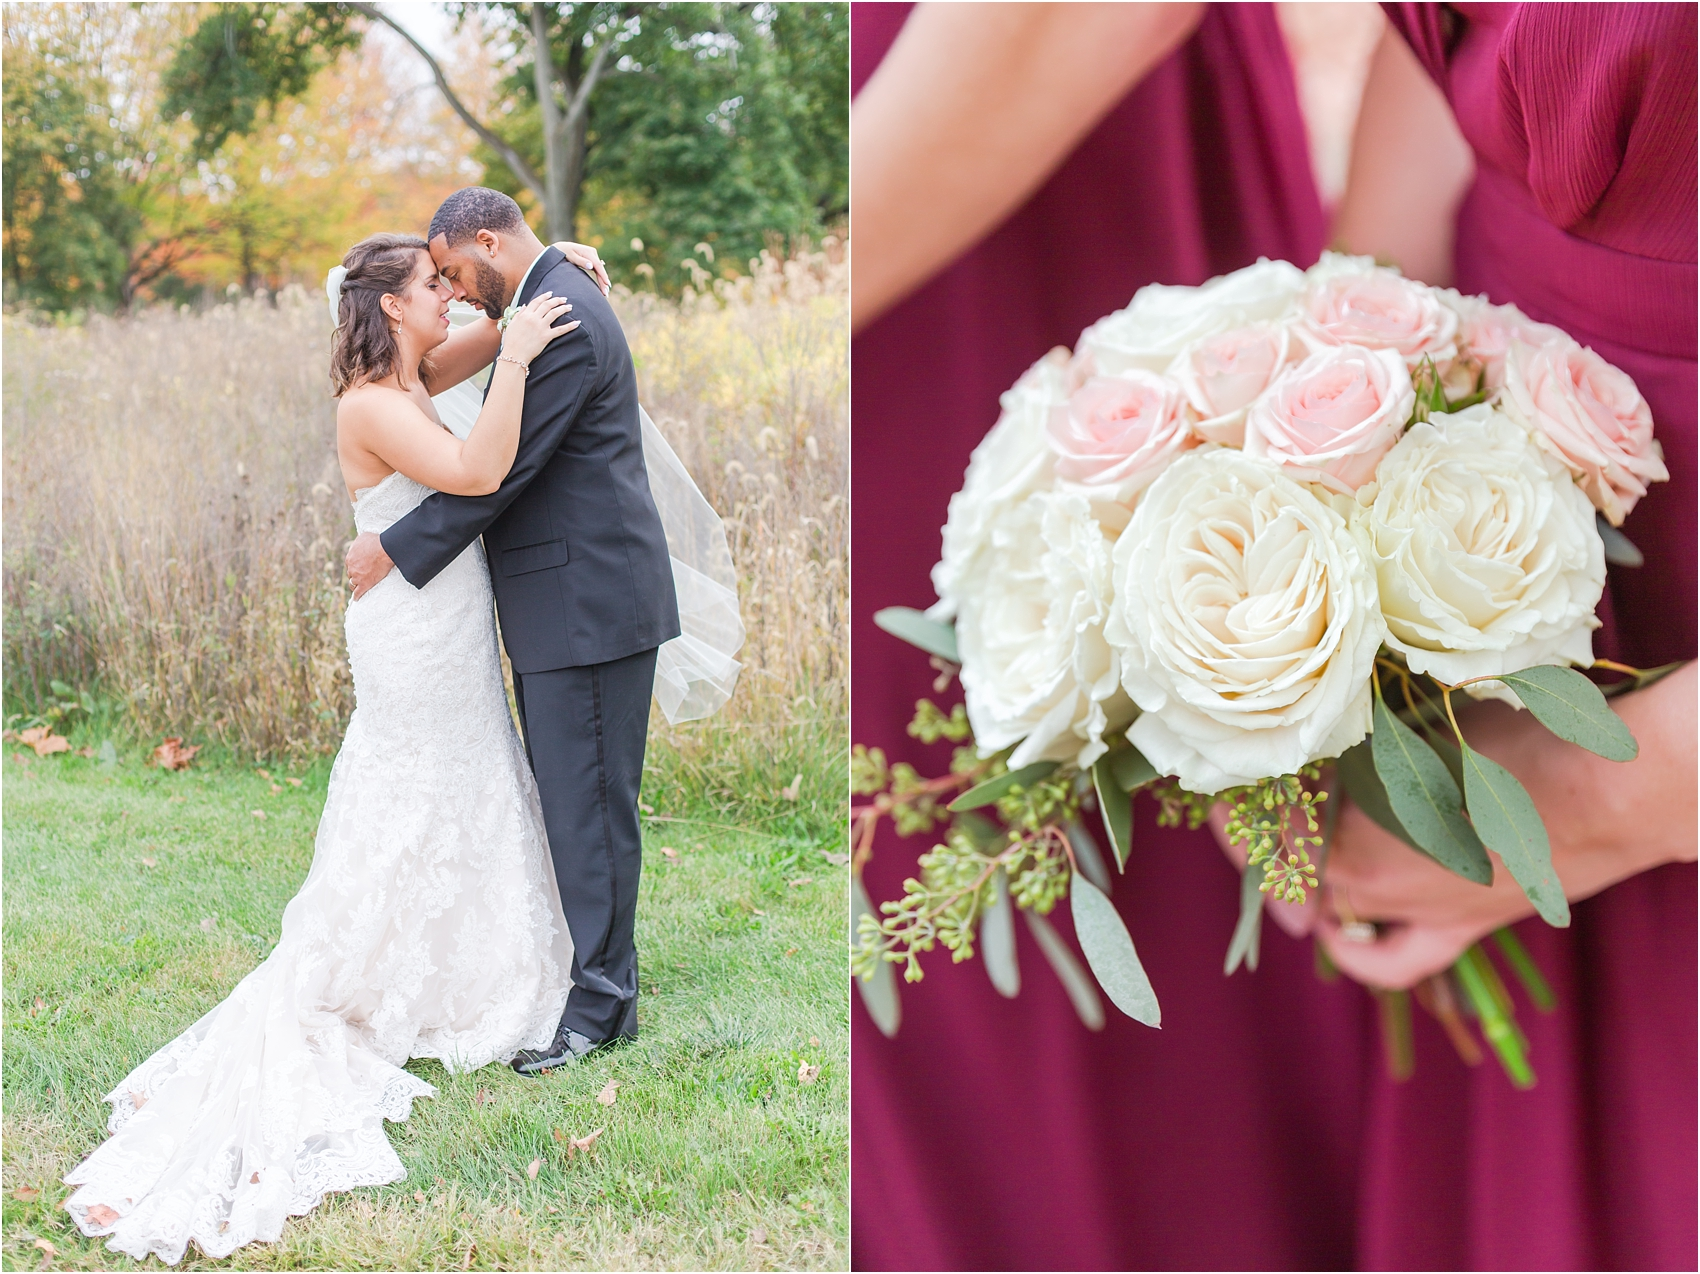 elegant-and-romantic-fall-wedding-photos-at-st-marys-catholic-church-in-monroe-michigan-by-courtney-carolyn-photography_0057.jpg